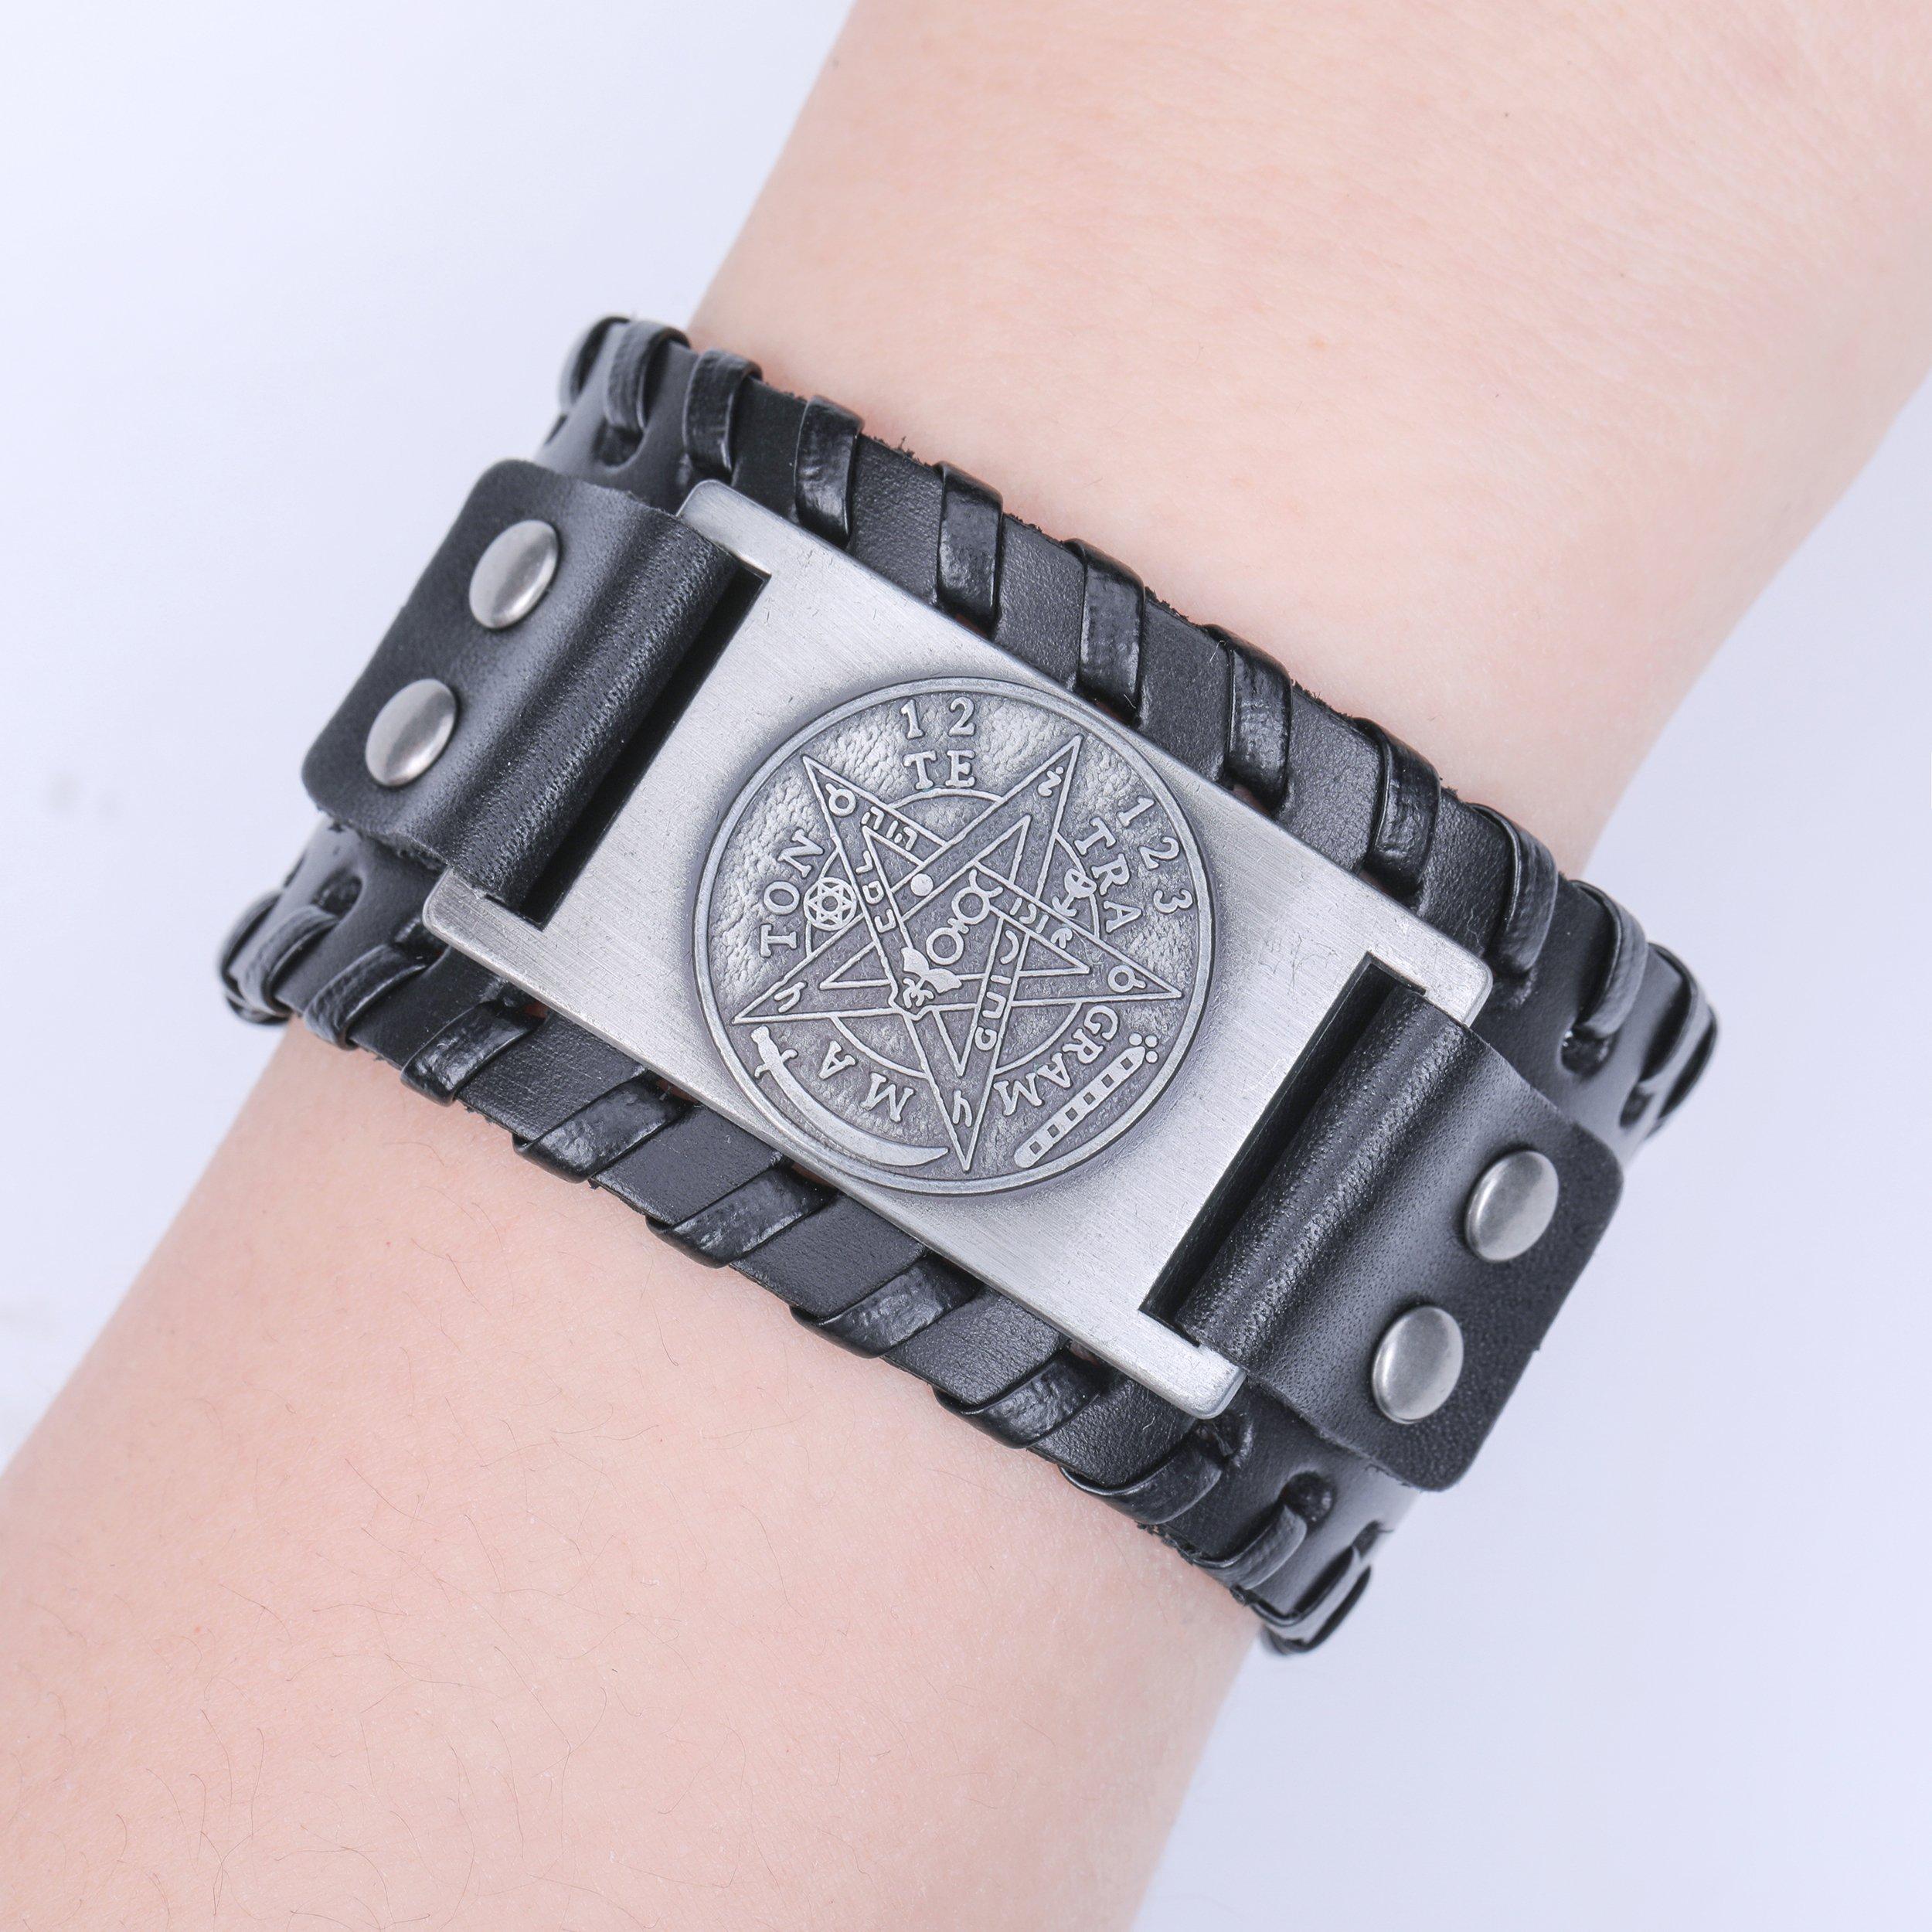 Pagan Viking Tetragrammaton Pentacle Symbol Talisman for Love Braided Wide Leather Wristband Bracelet (Antique Silver,Black) by Skyrim (Image #5)